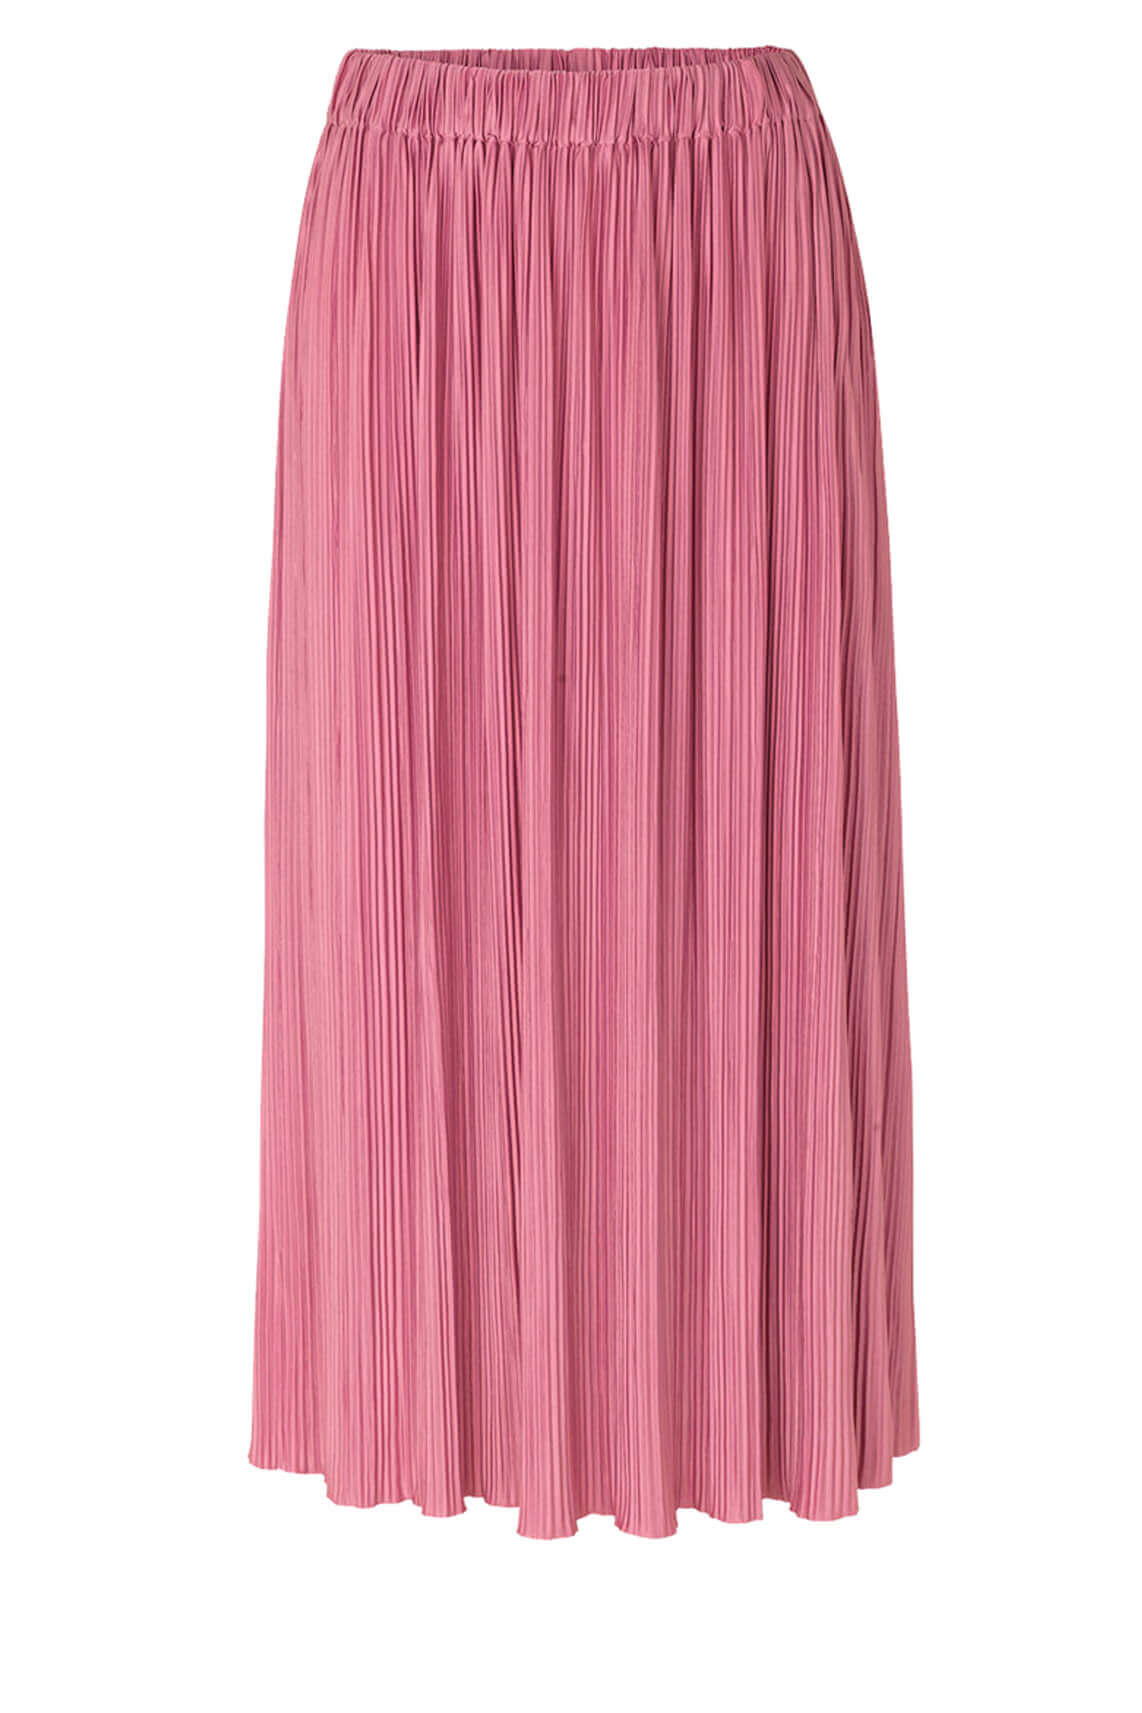 Samsoe Samsoe Dames Uma plissé rok roze